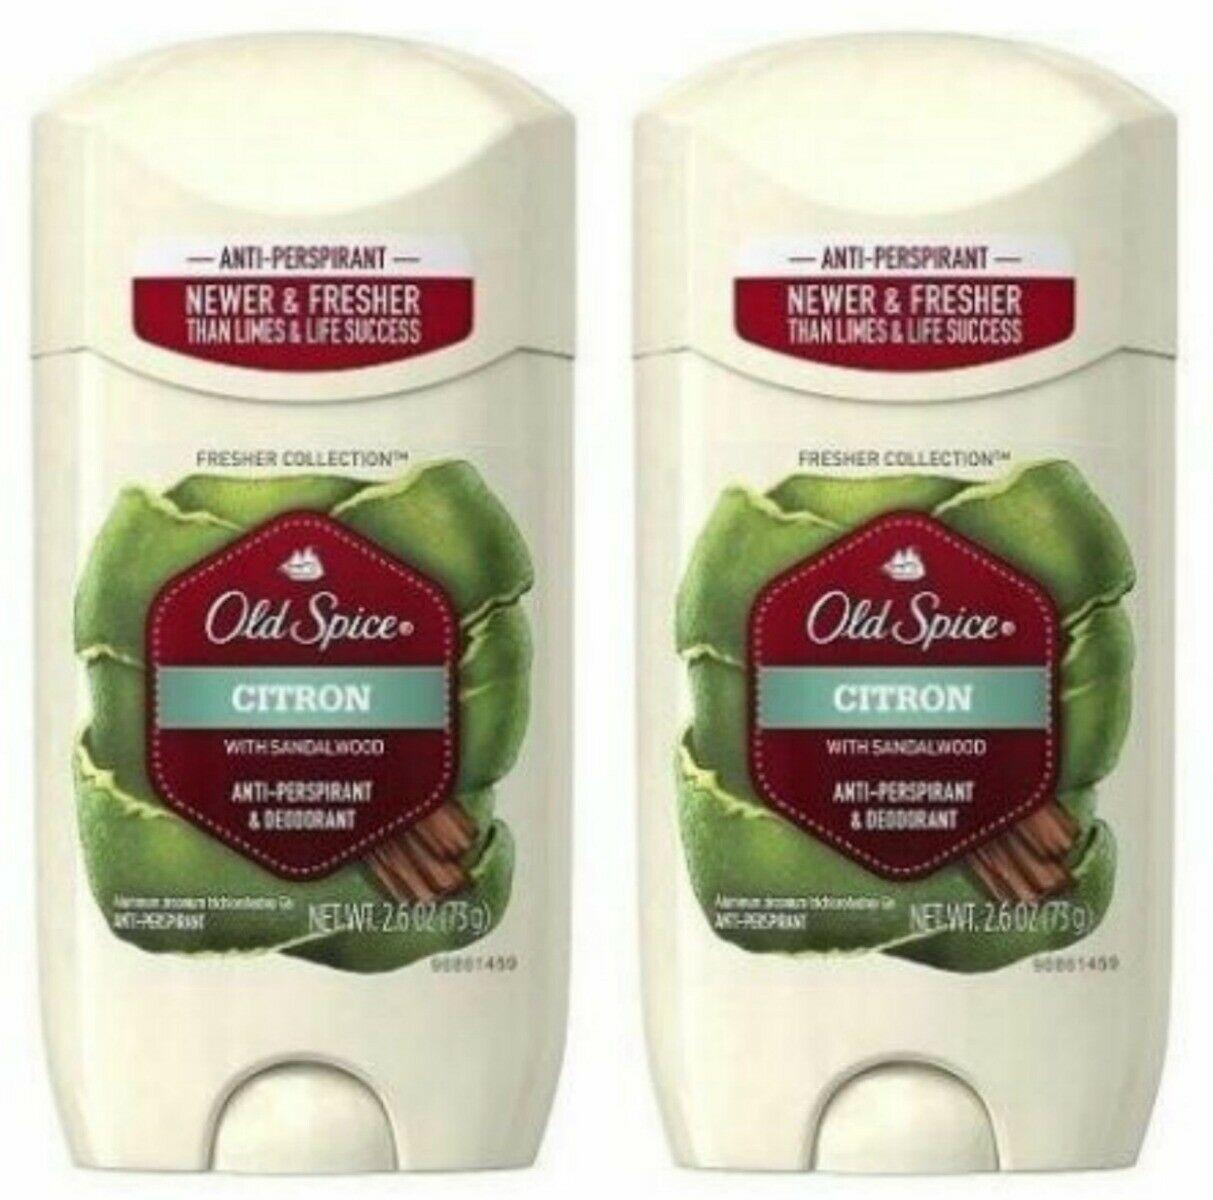 2 Old Spice Citron Sandalwood Deodorant/Anti Perspirant Mens 2.6 oz Solid Lot